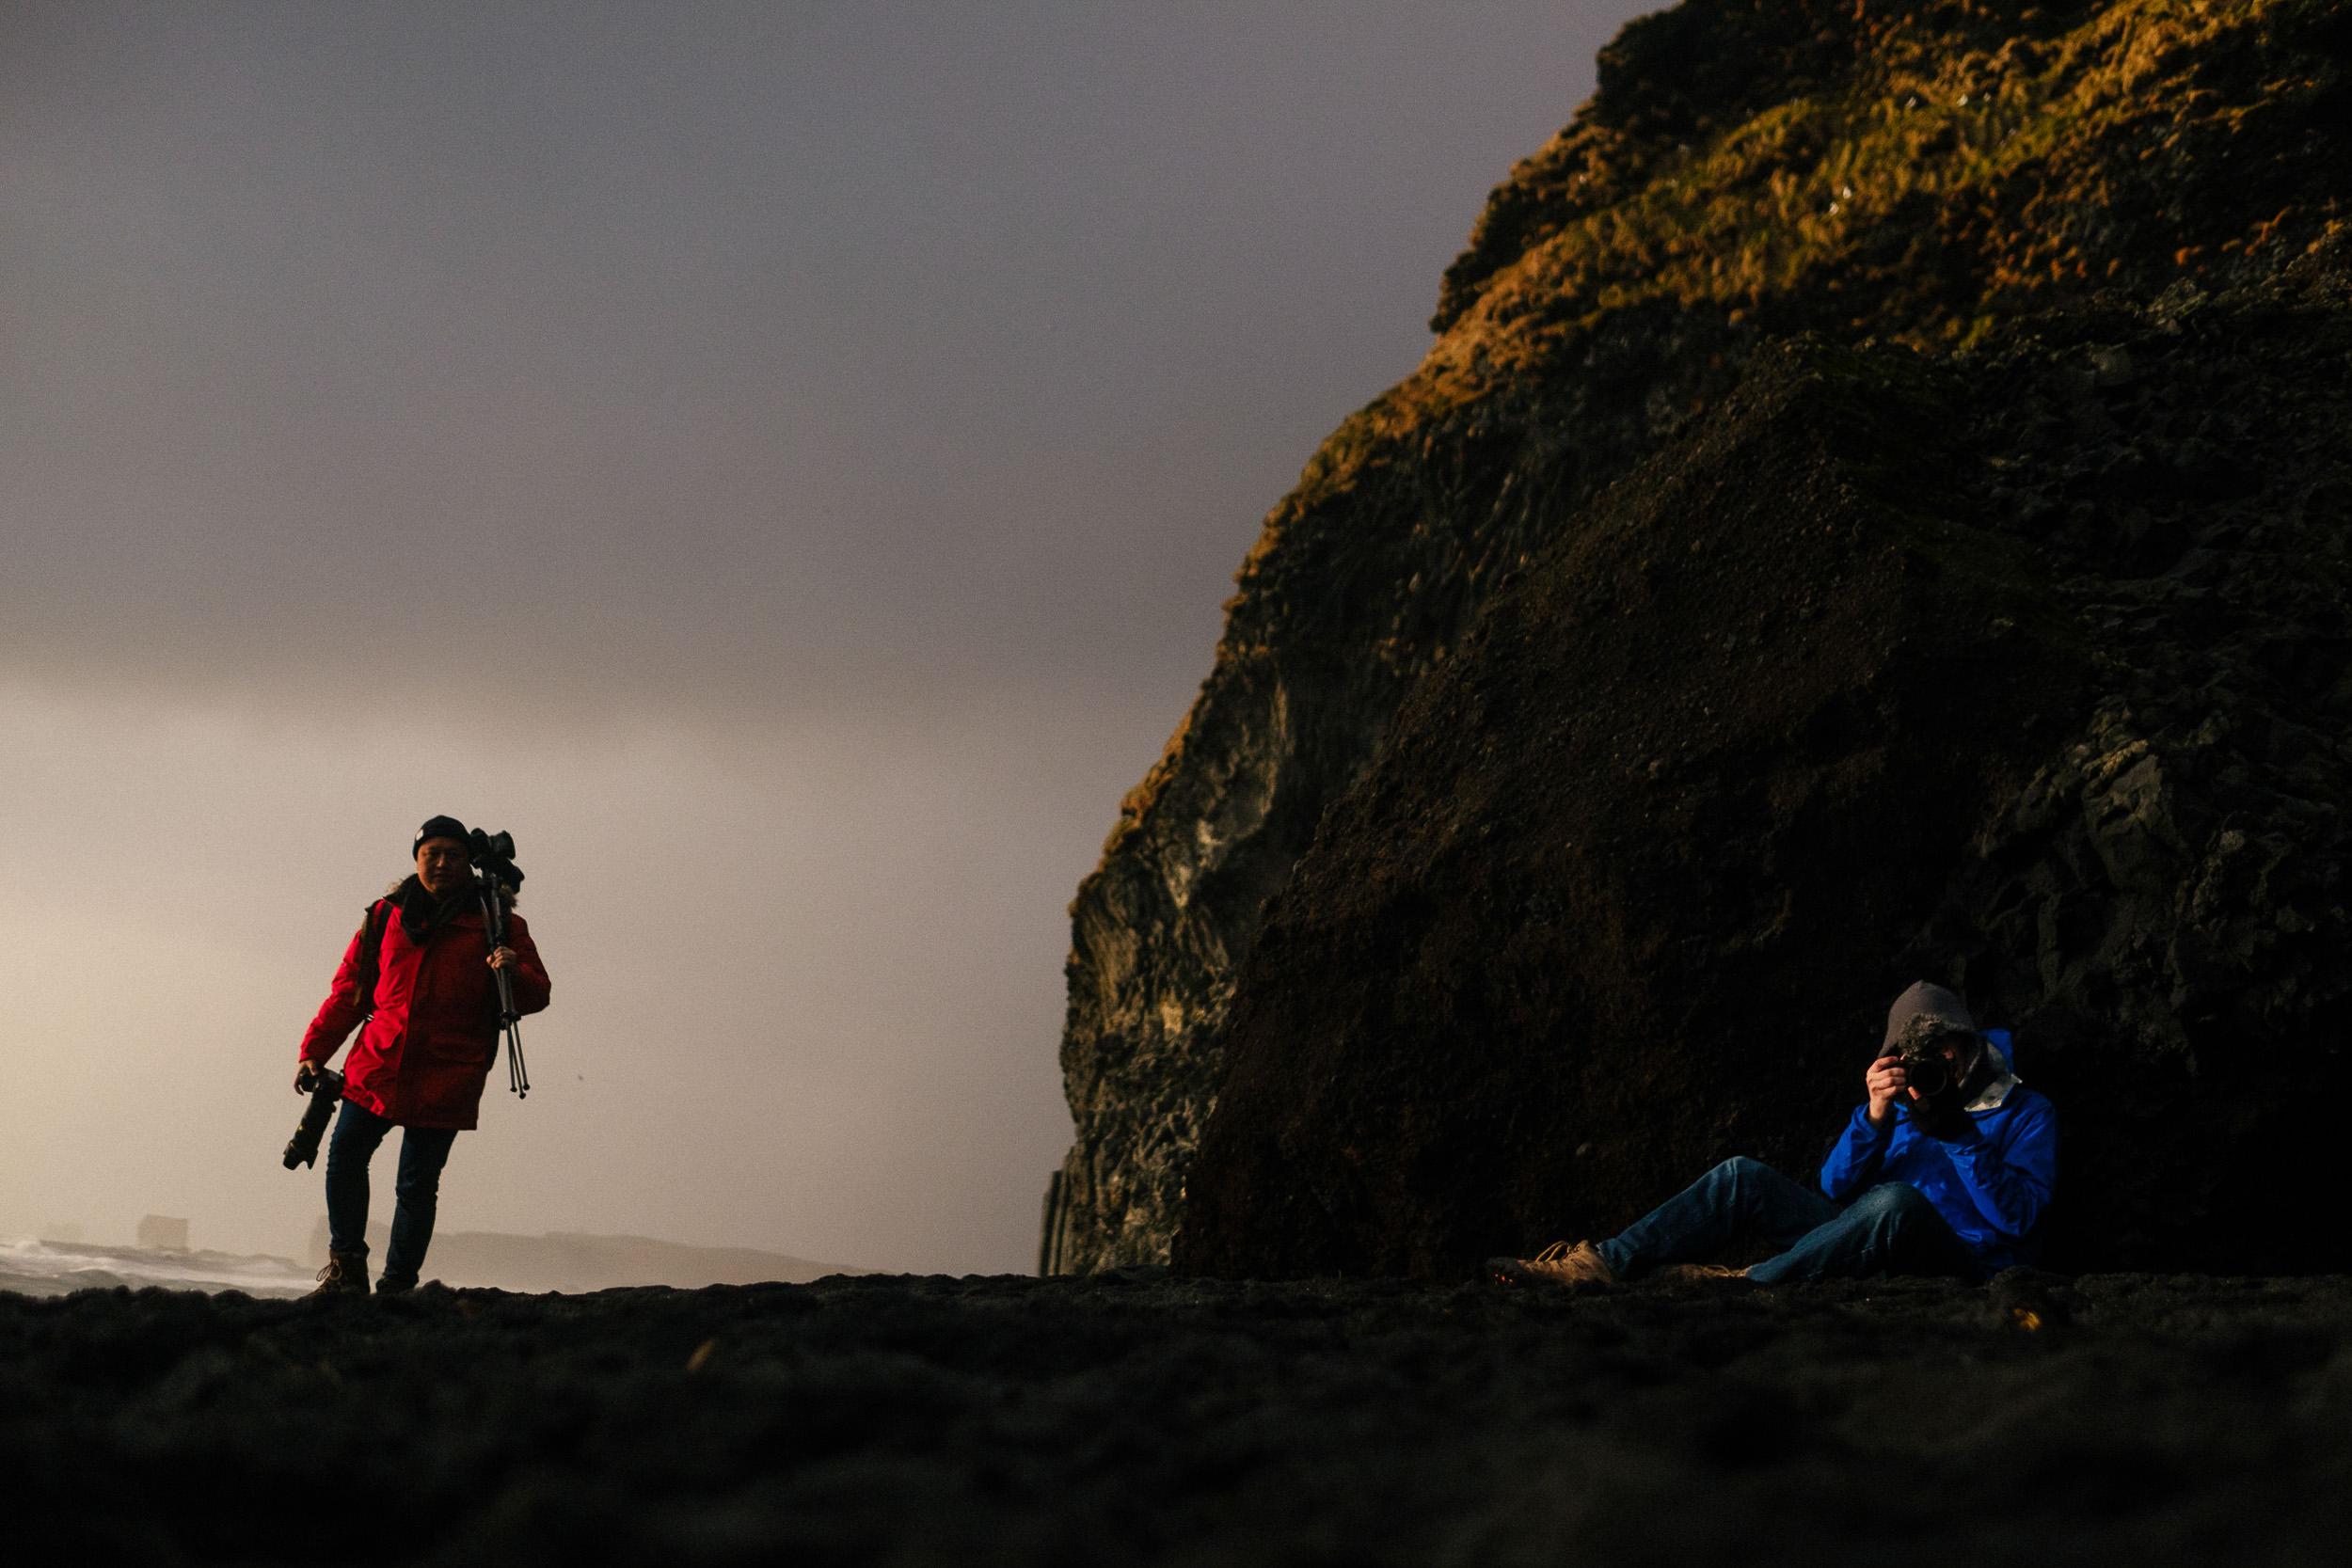 Collective_Wander_Iceland_Photographers_Trip_062.jpg